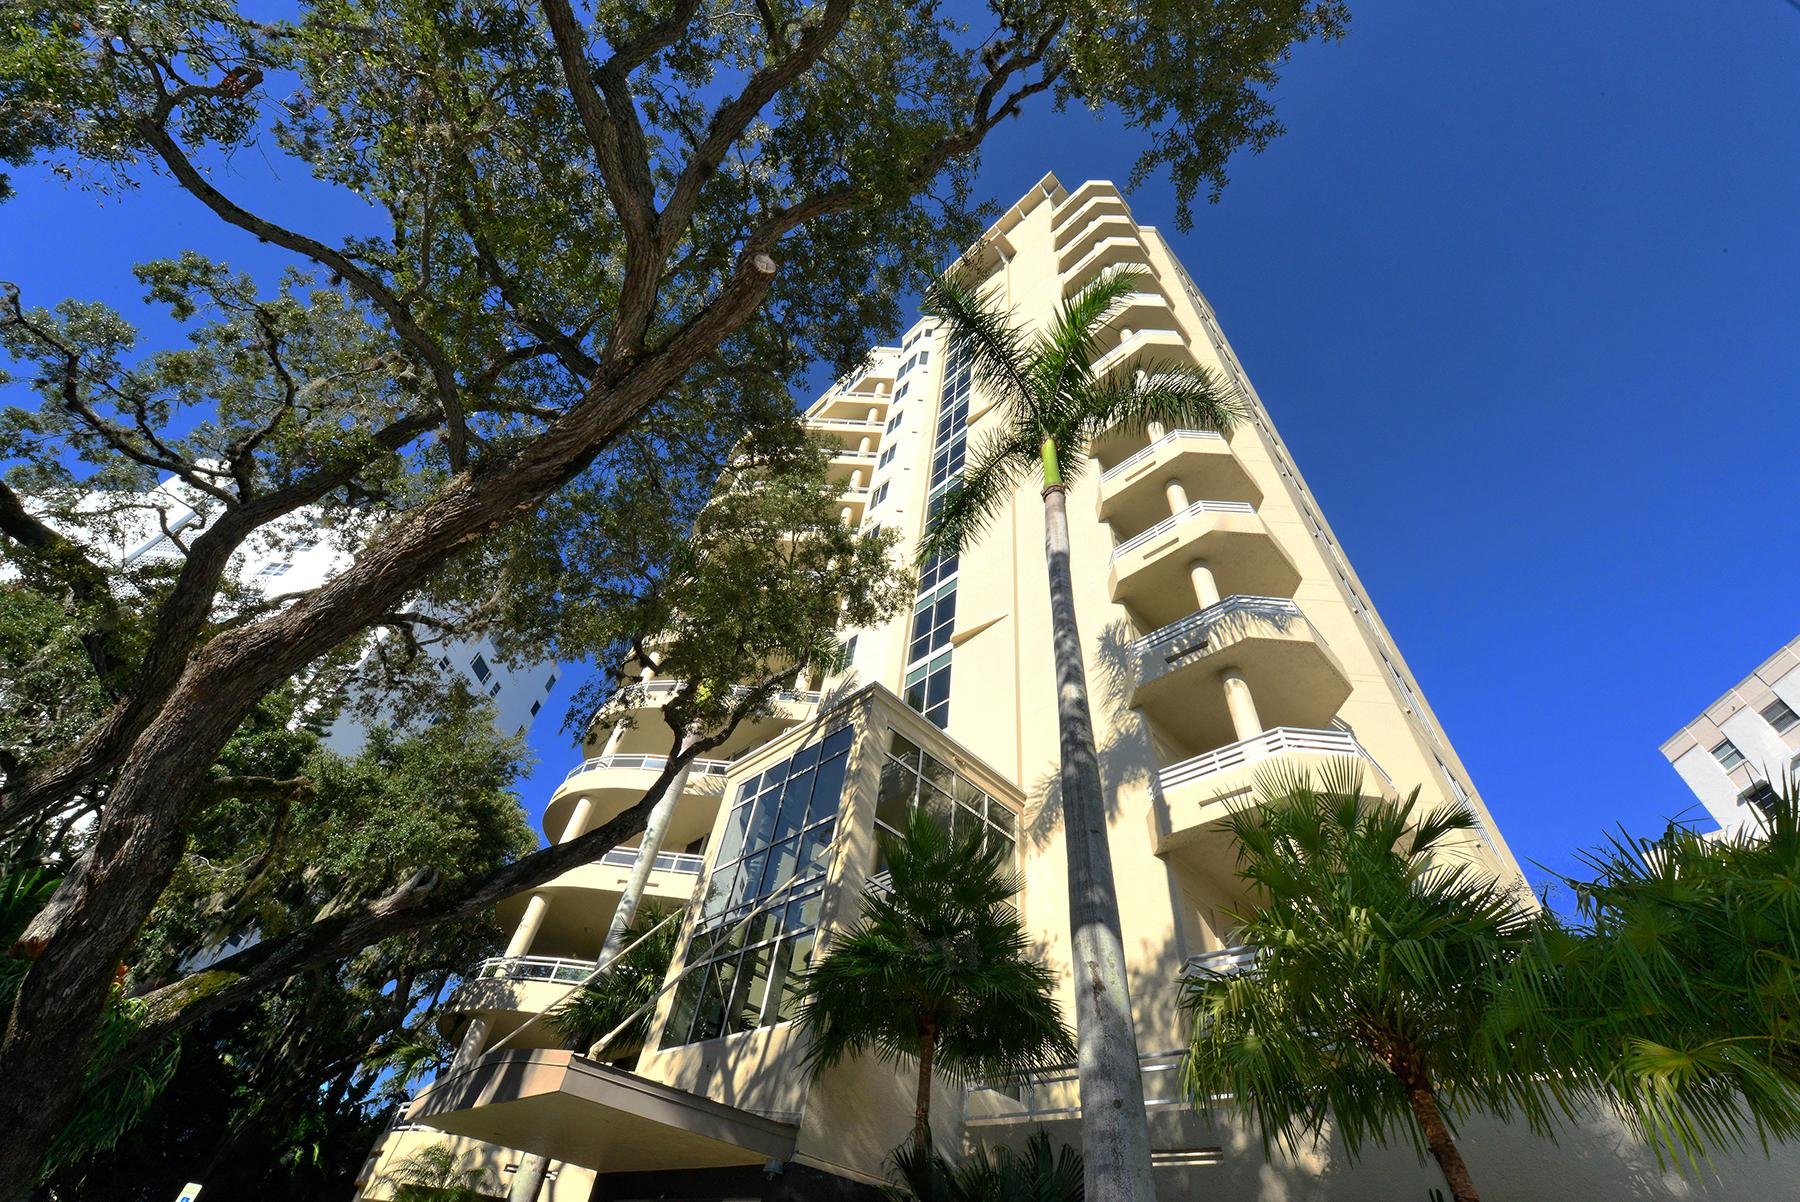 Condominium for Sale at SARASOTA 500 S Palm Ave 22 Sarasota, Florida, 34236 United States